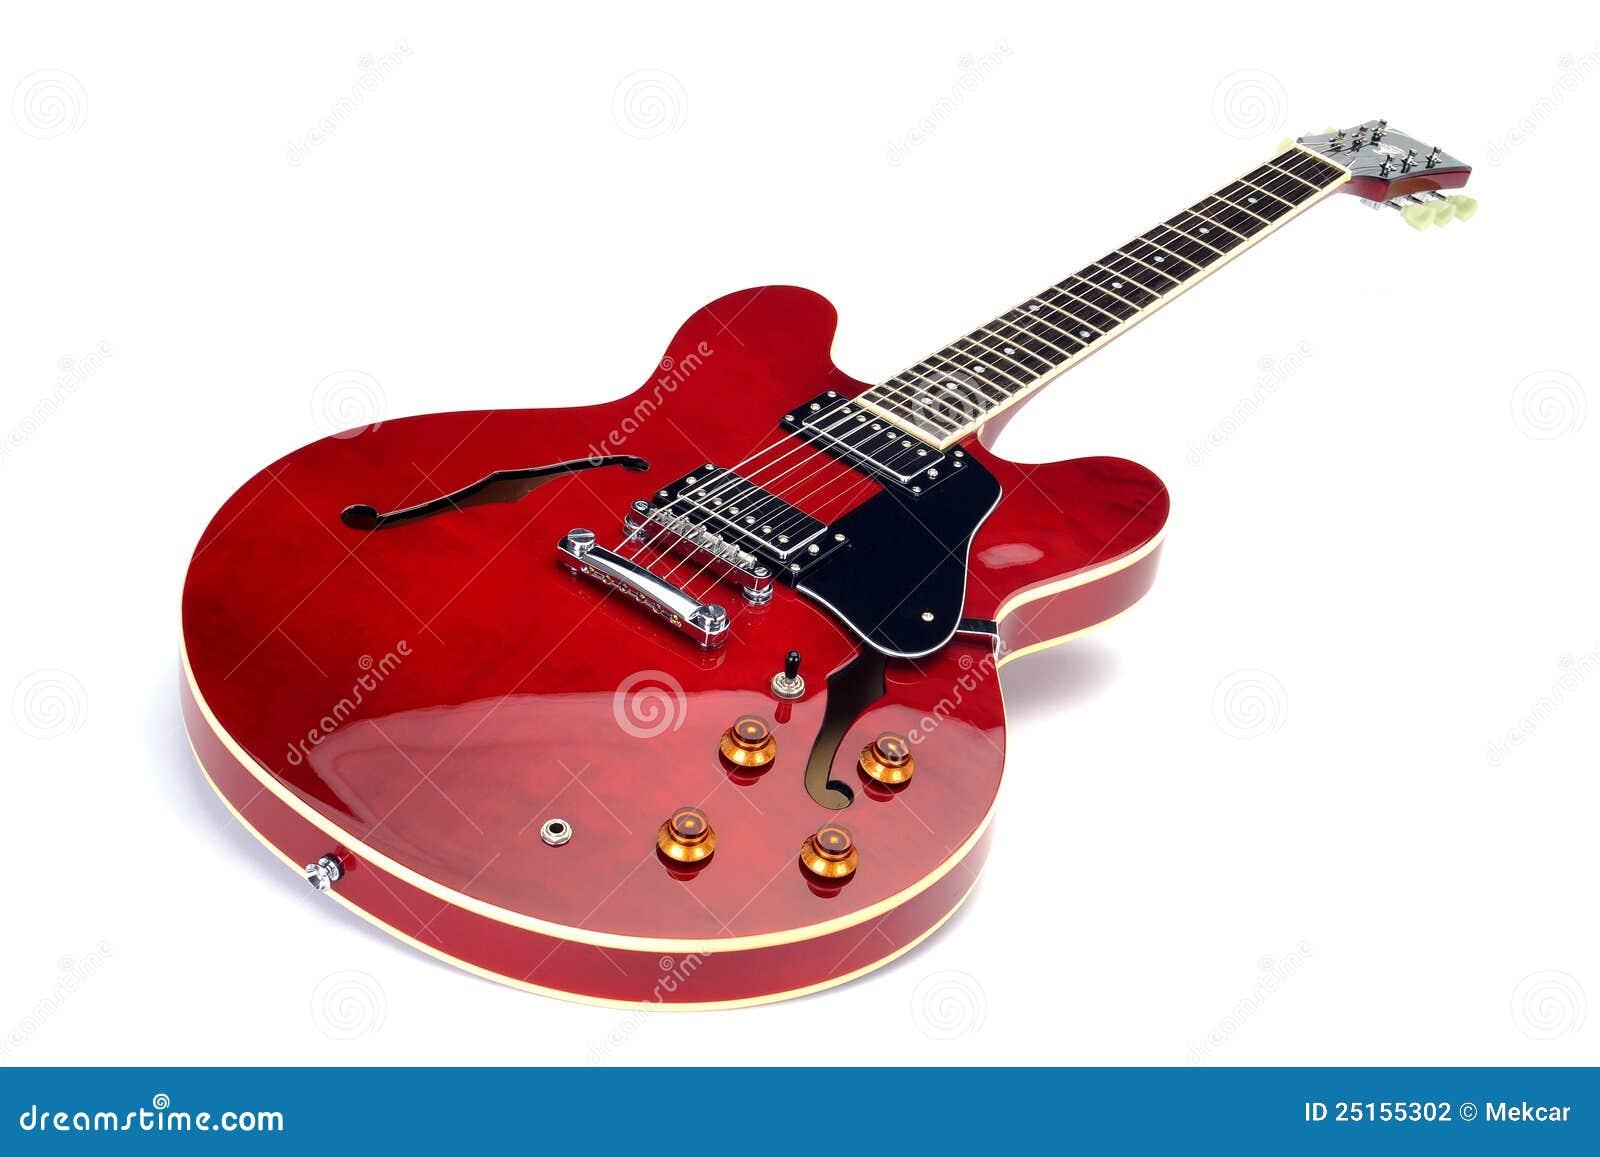 guitare lectrique rouge photo stock image du angle. Black Bedroom Furniture Sets. Home Design Ideas